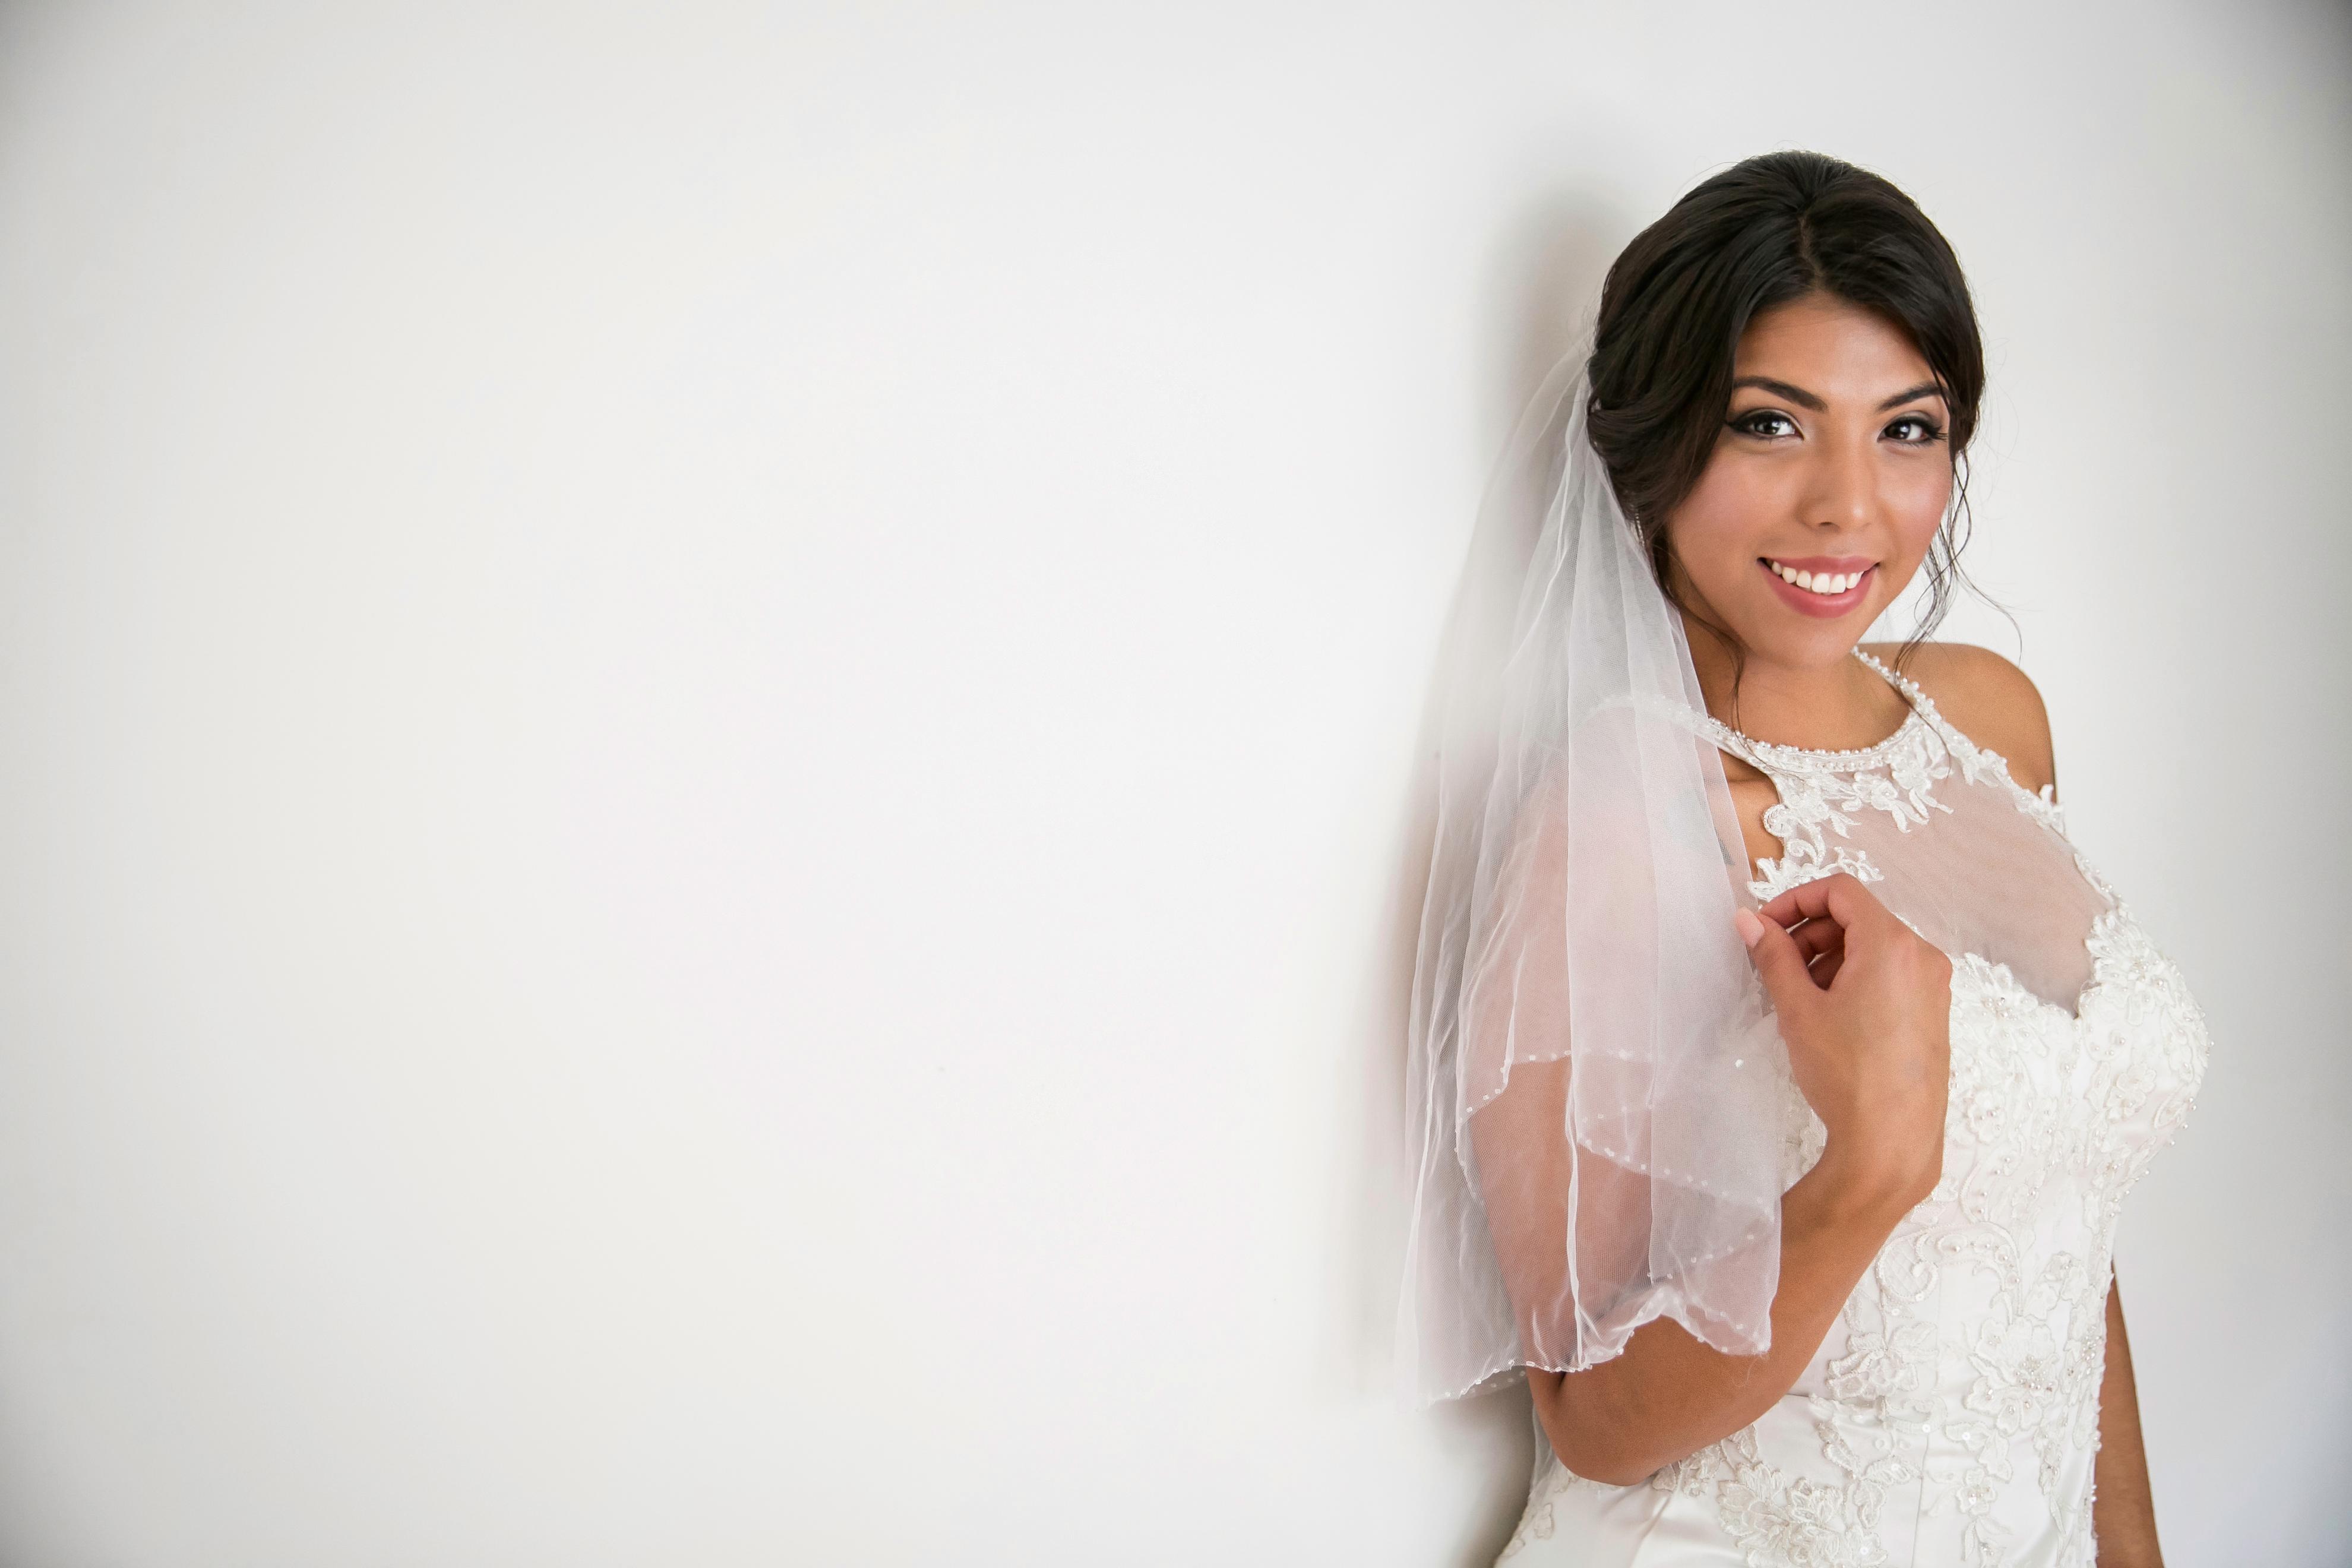 Simple Bride Portrait: Window Light